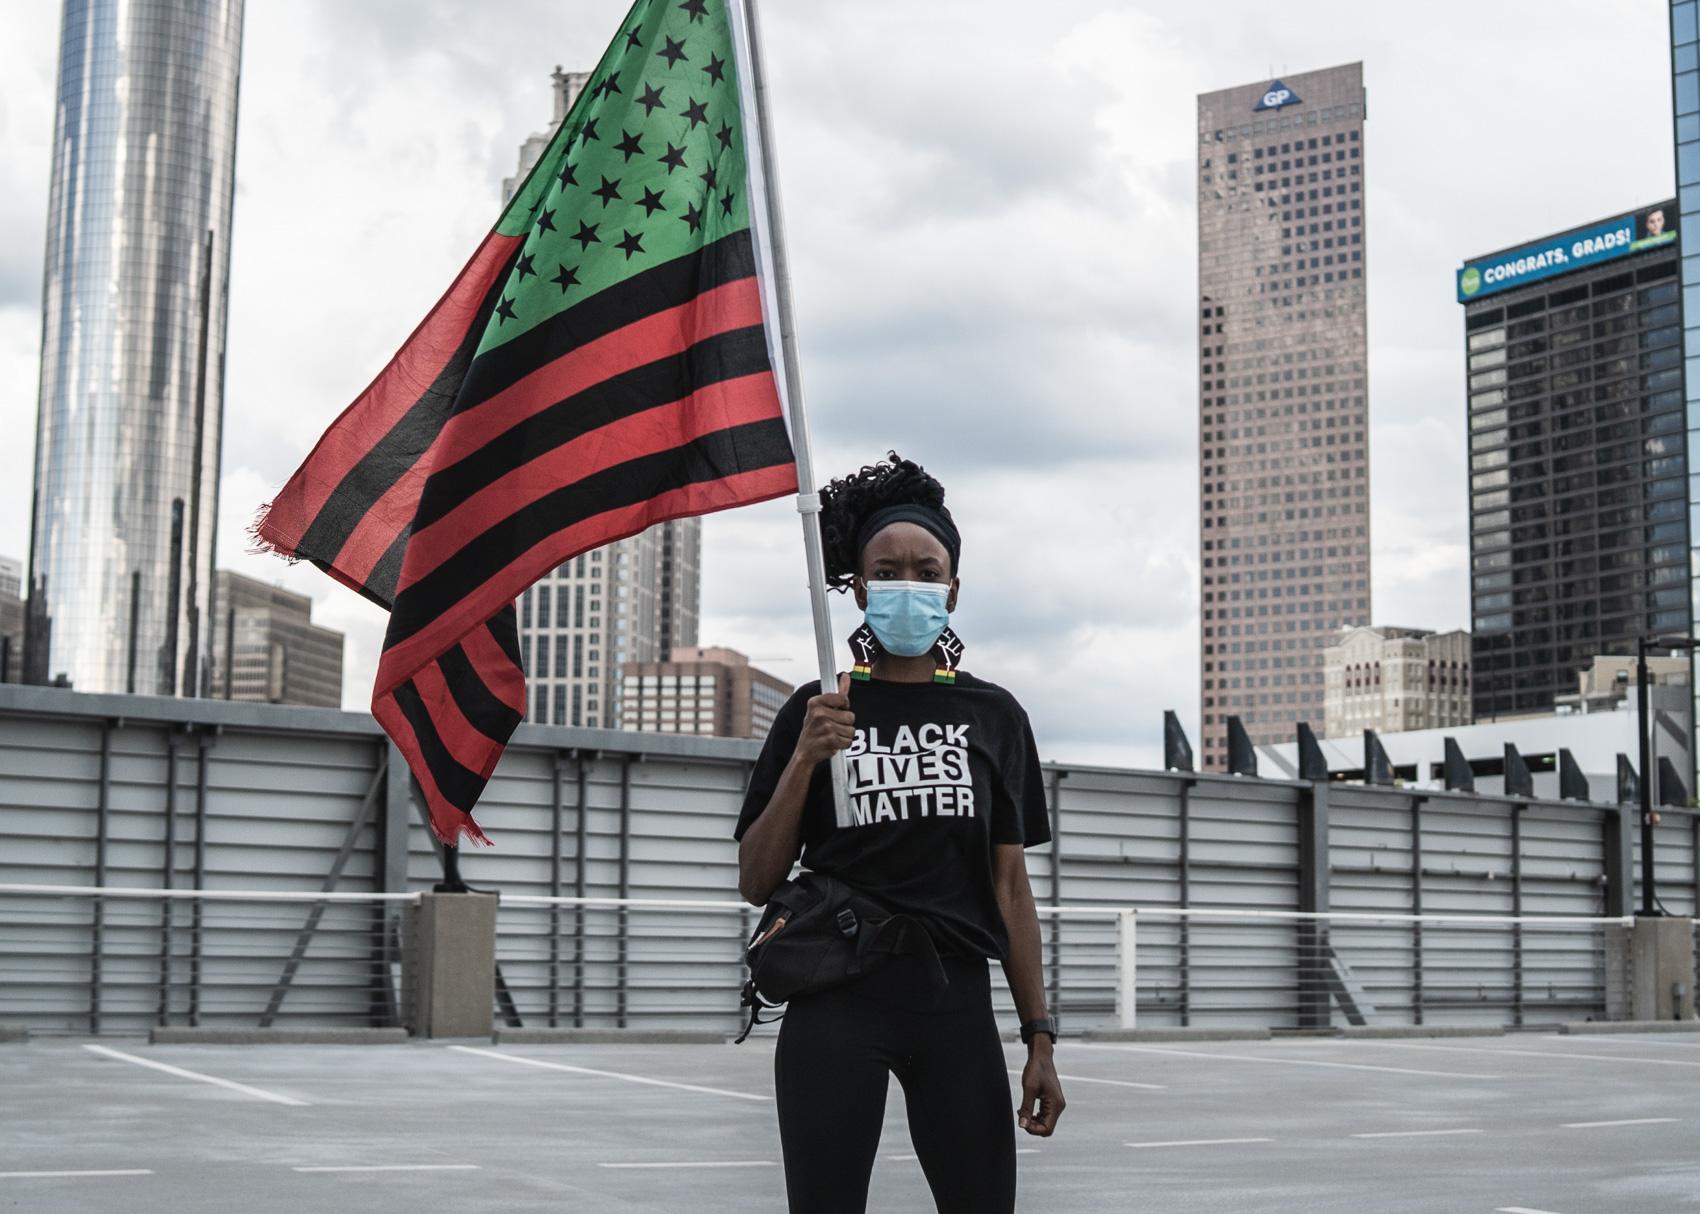 protestor holding flag